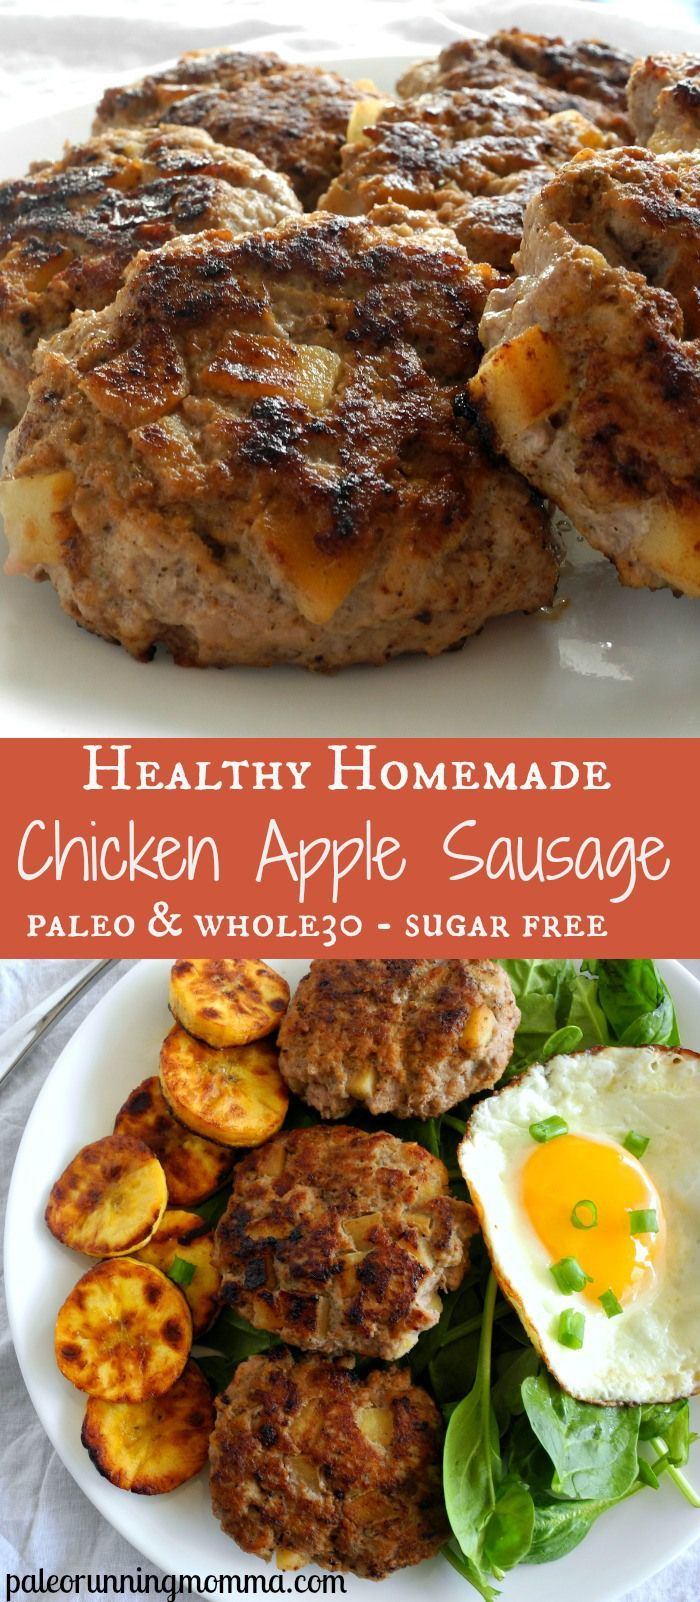 Healthy homemade chicken apple sausage #paleo #whole30 #sugarfree @paleorunmomma